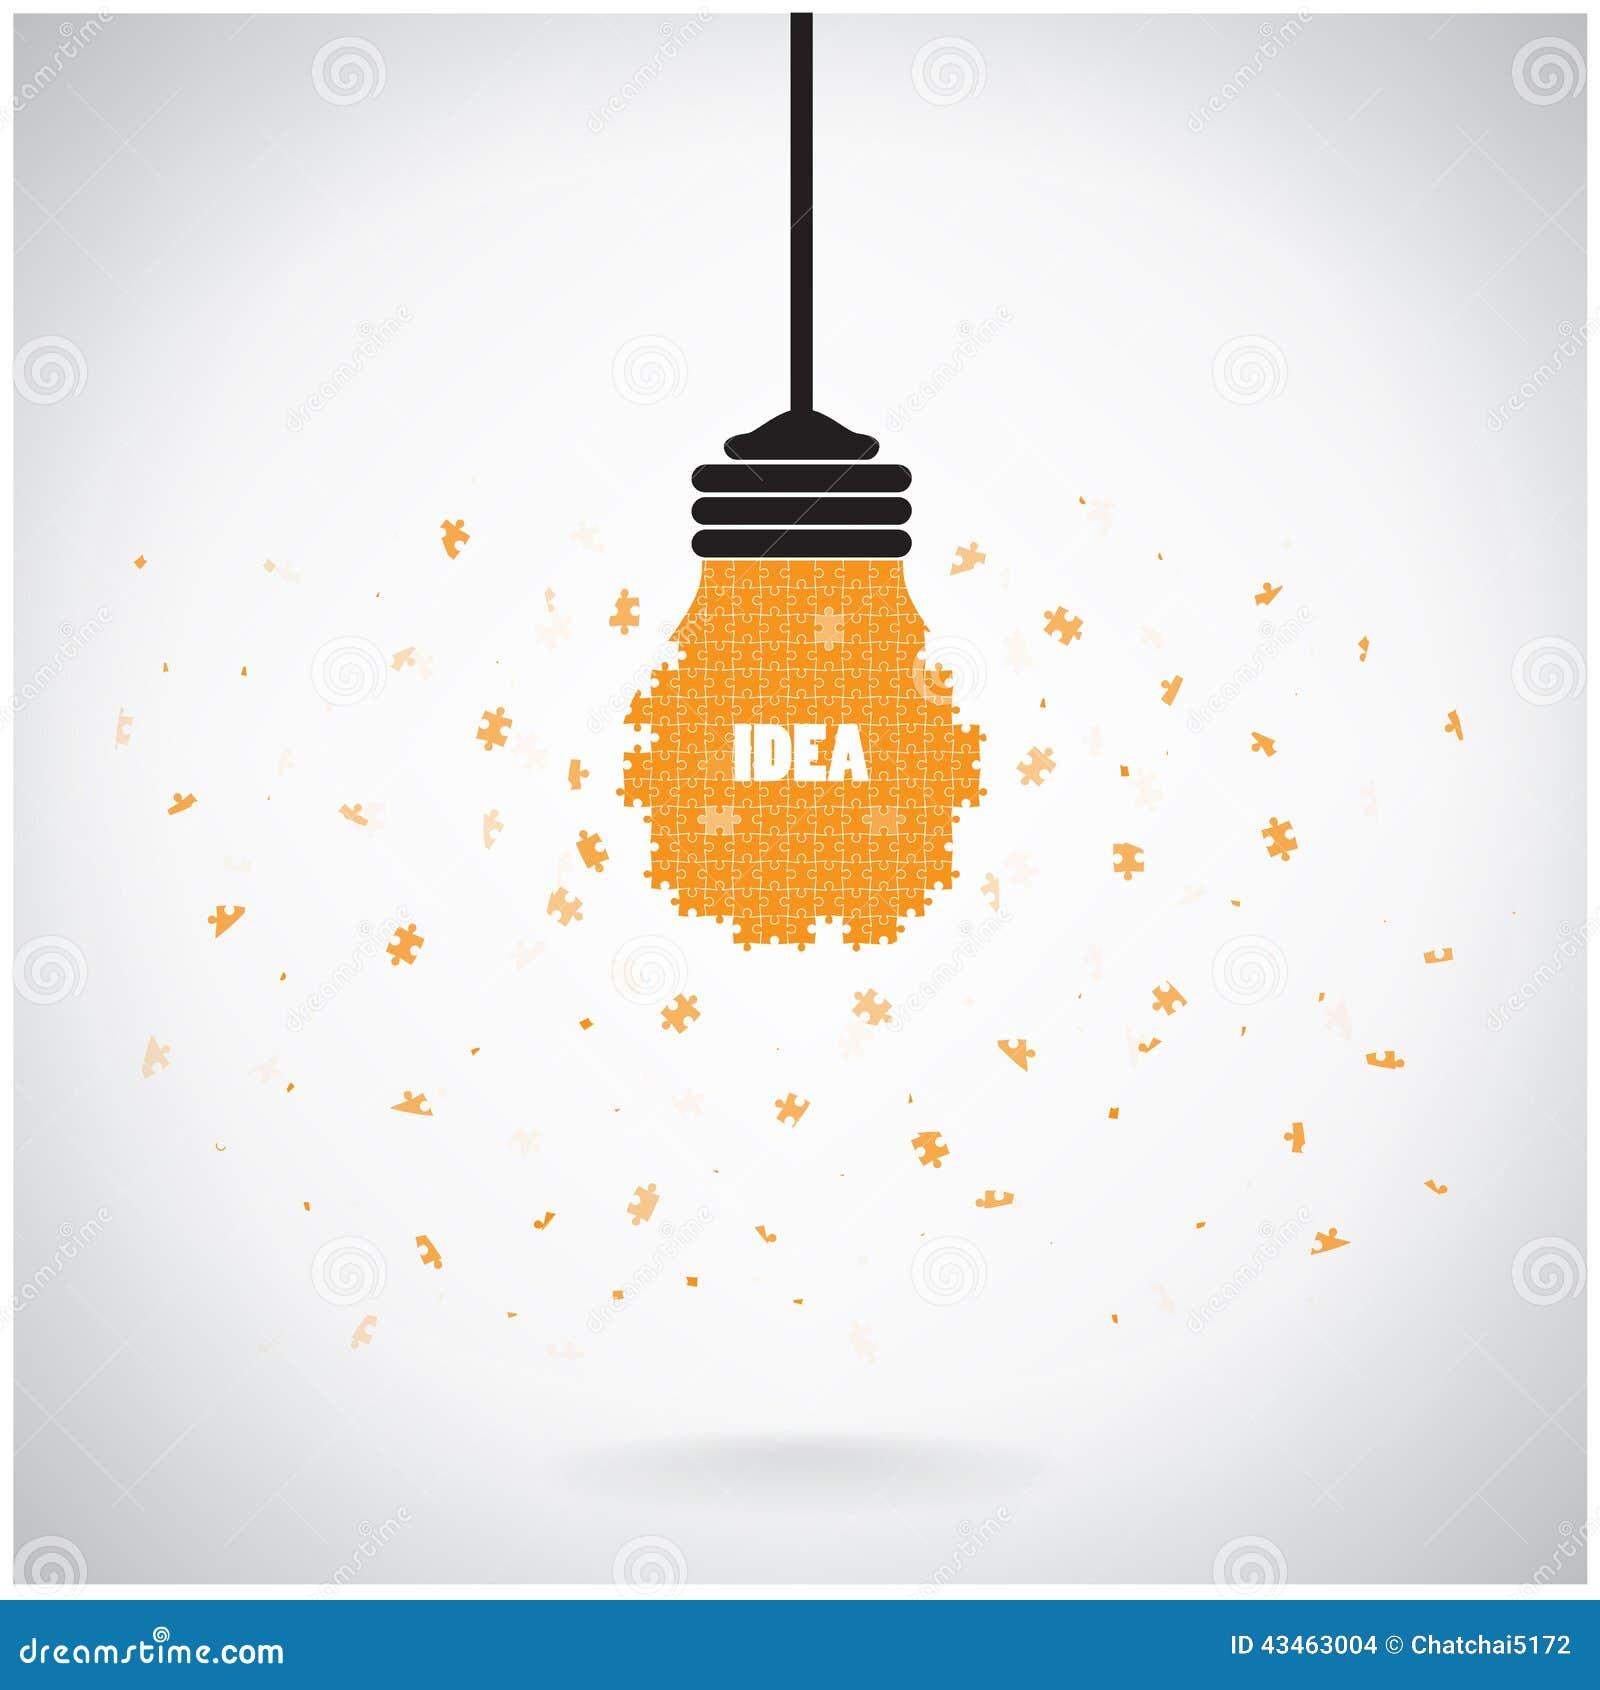 creative puzzle light bulb idea concept background design for poster